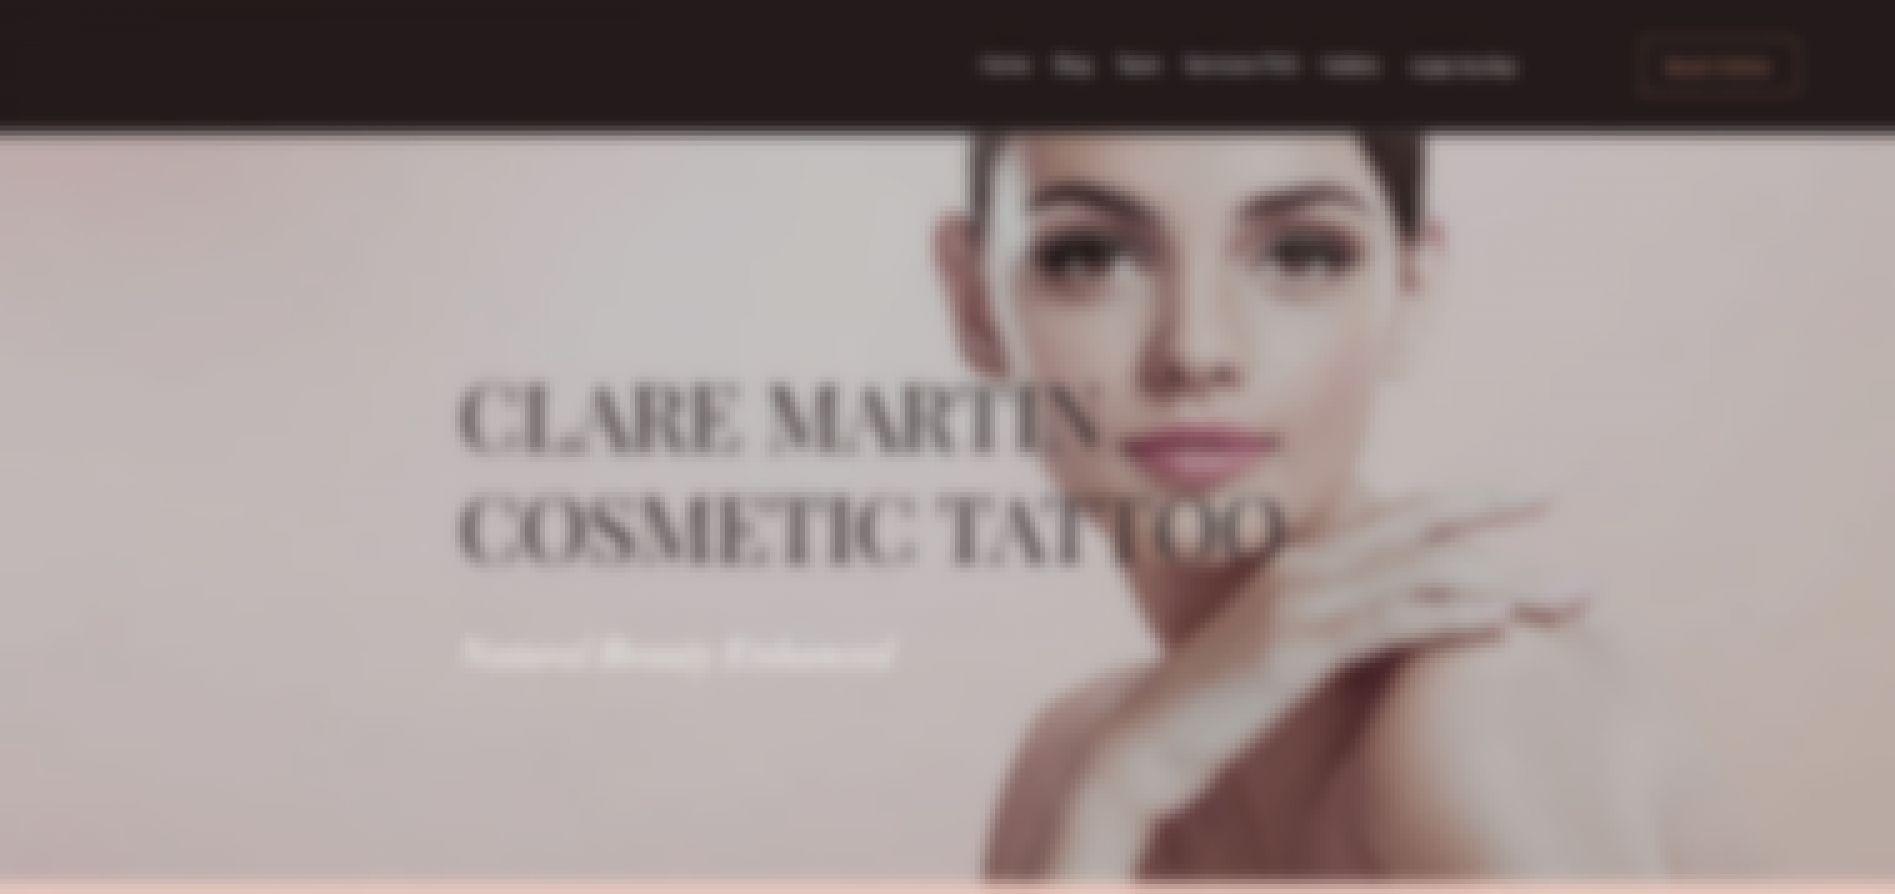 clare martin cosmetic tattoo